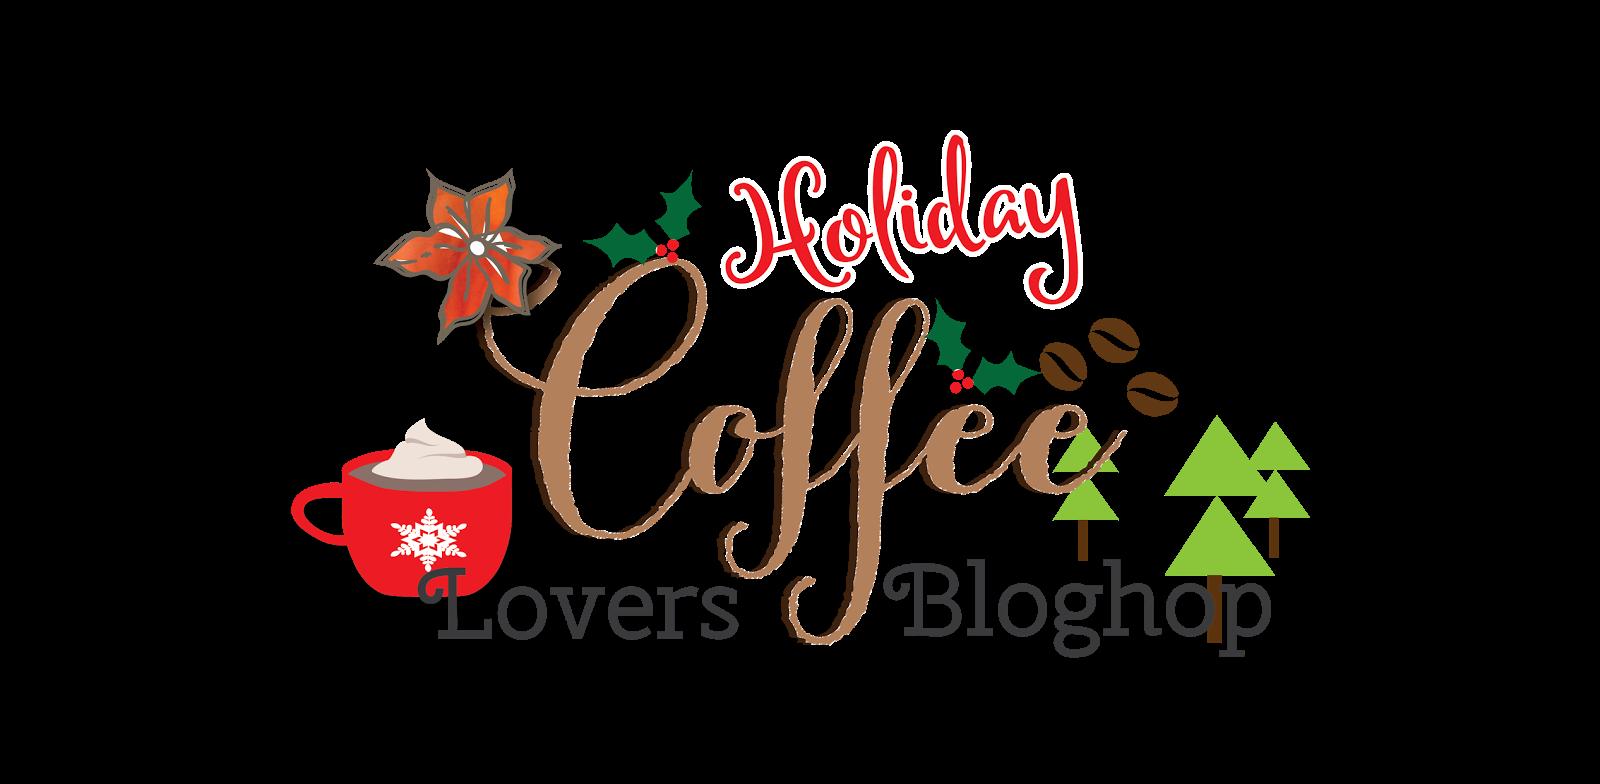 Handmade by Yuki: Holiday Coffee Lovers Bloghop - Happy Holidays